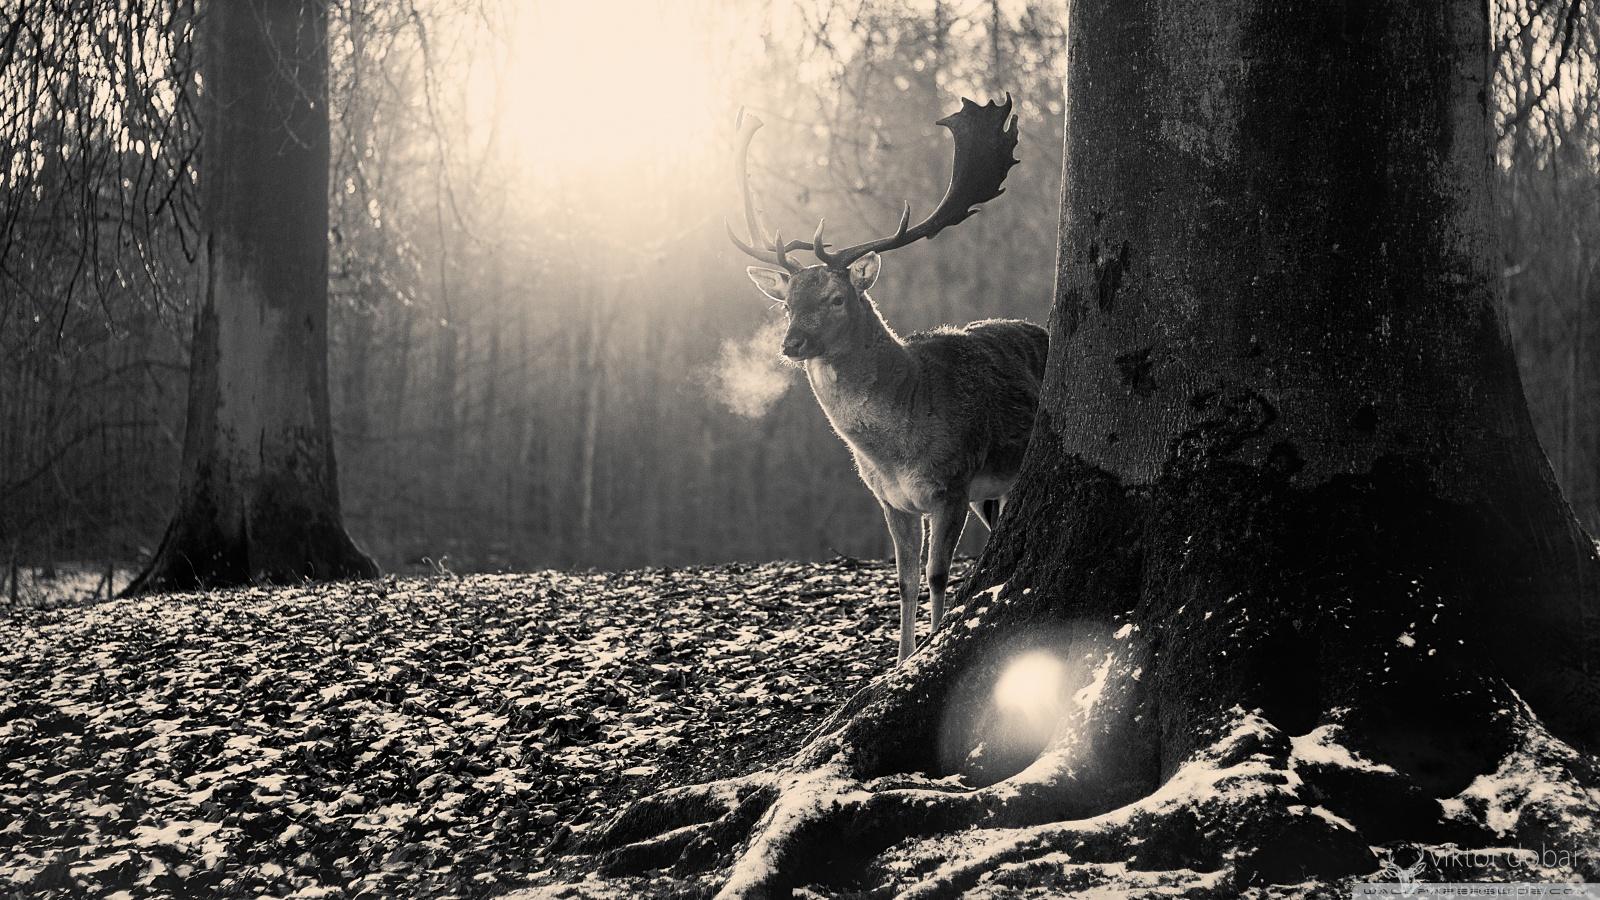 stag_winter-wallpaper-1600x900